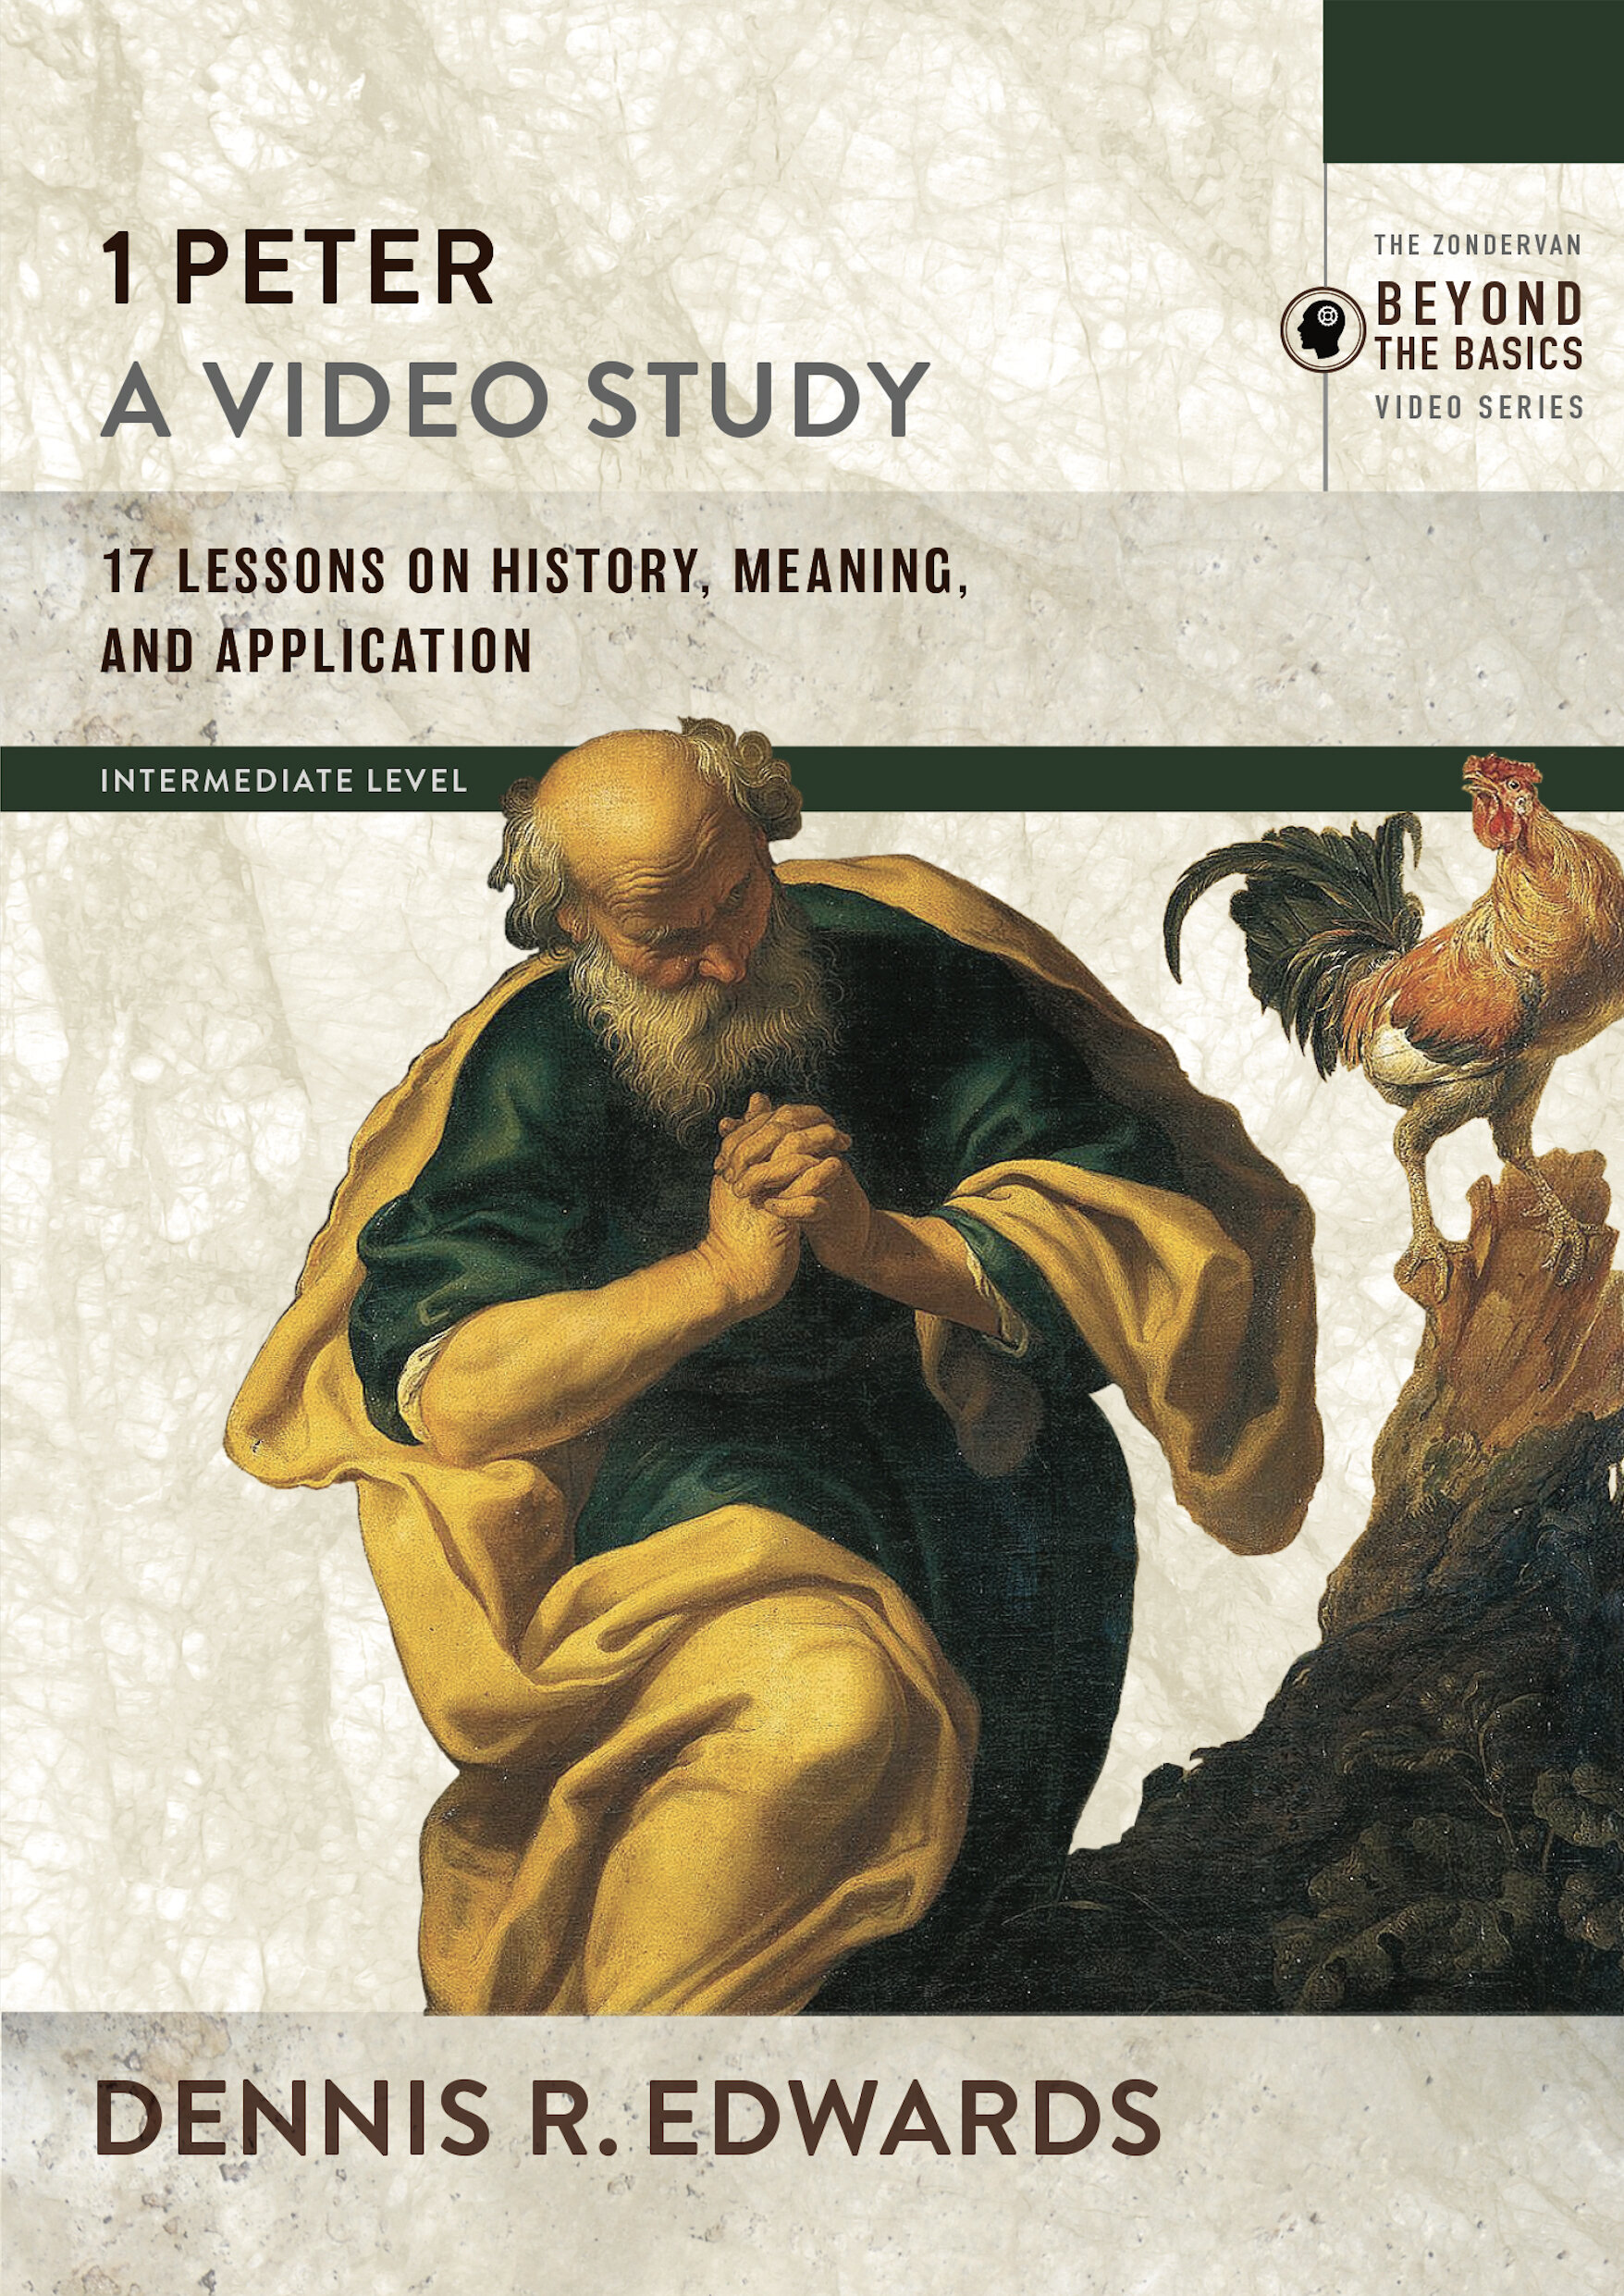 1 Peter: A Video Study